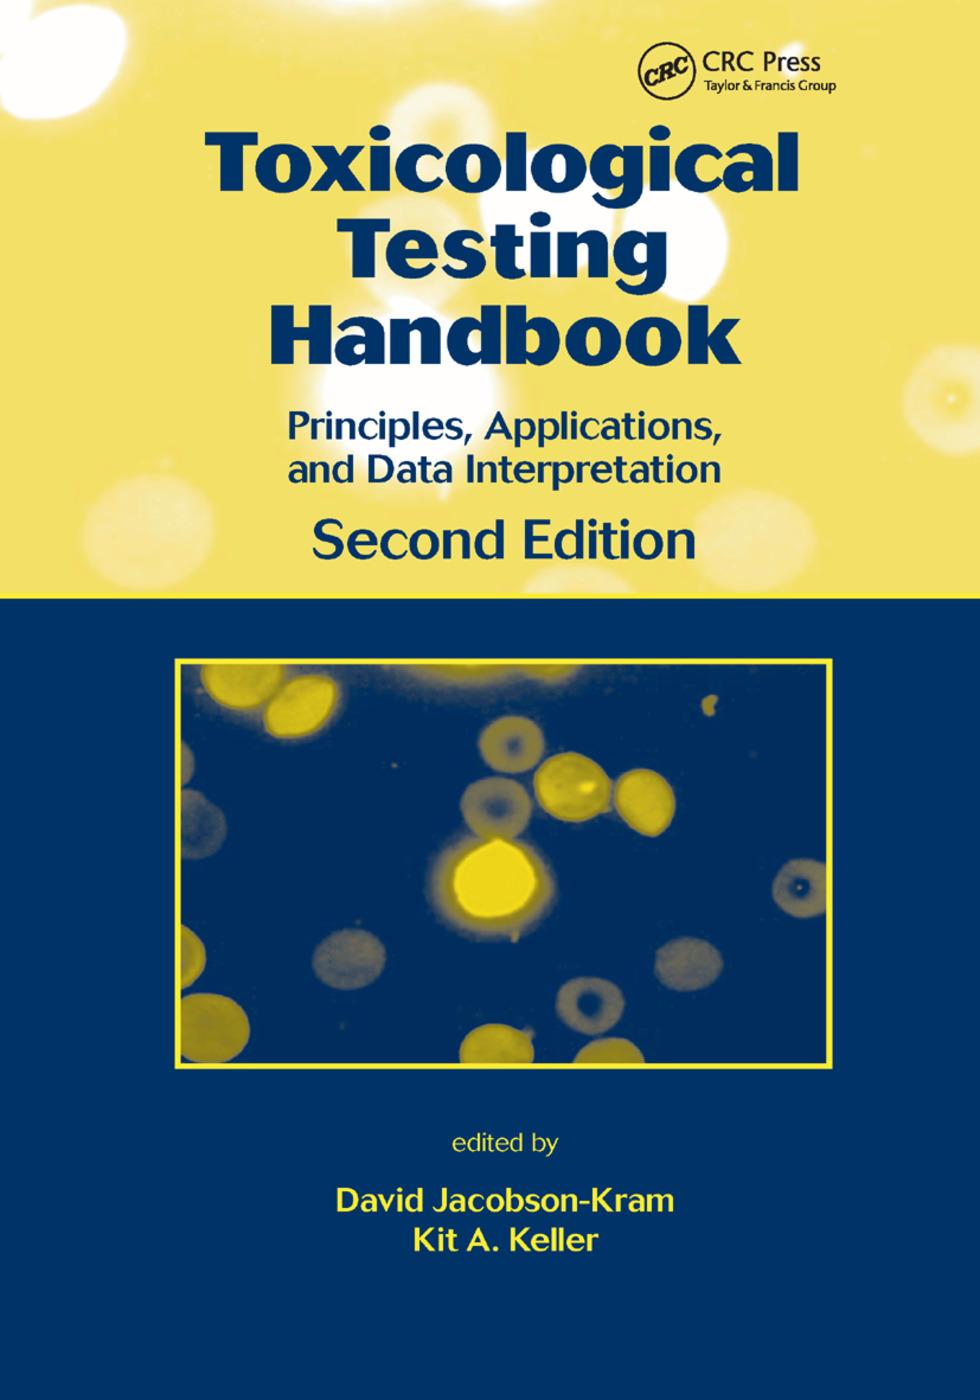 Toxicological Testing Handbook: Principles, Applications and Data Interpretation, 2nd Edition (Paperback) book cover